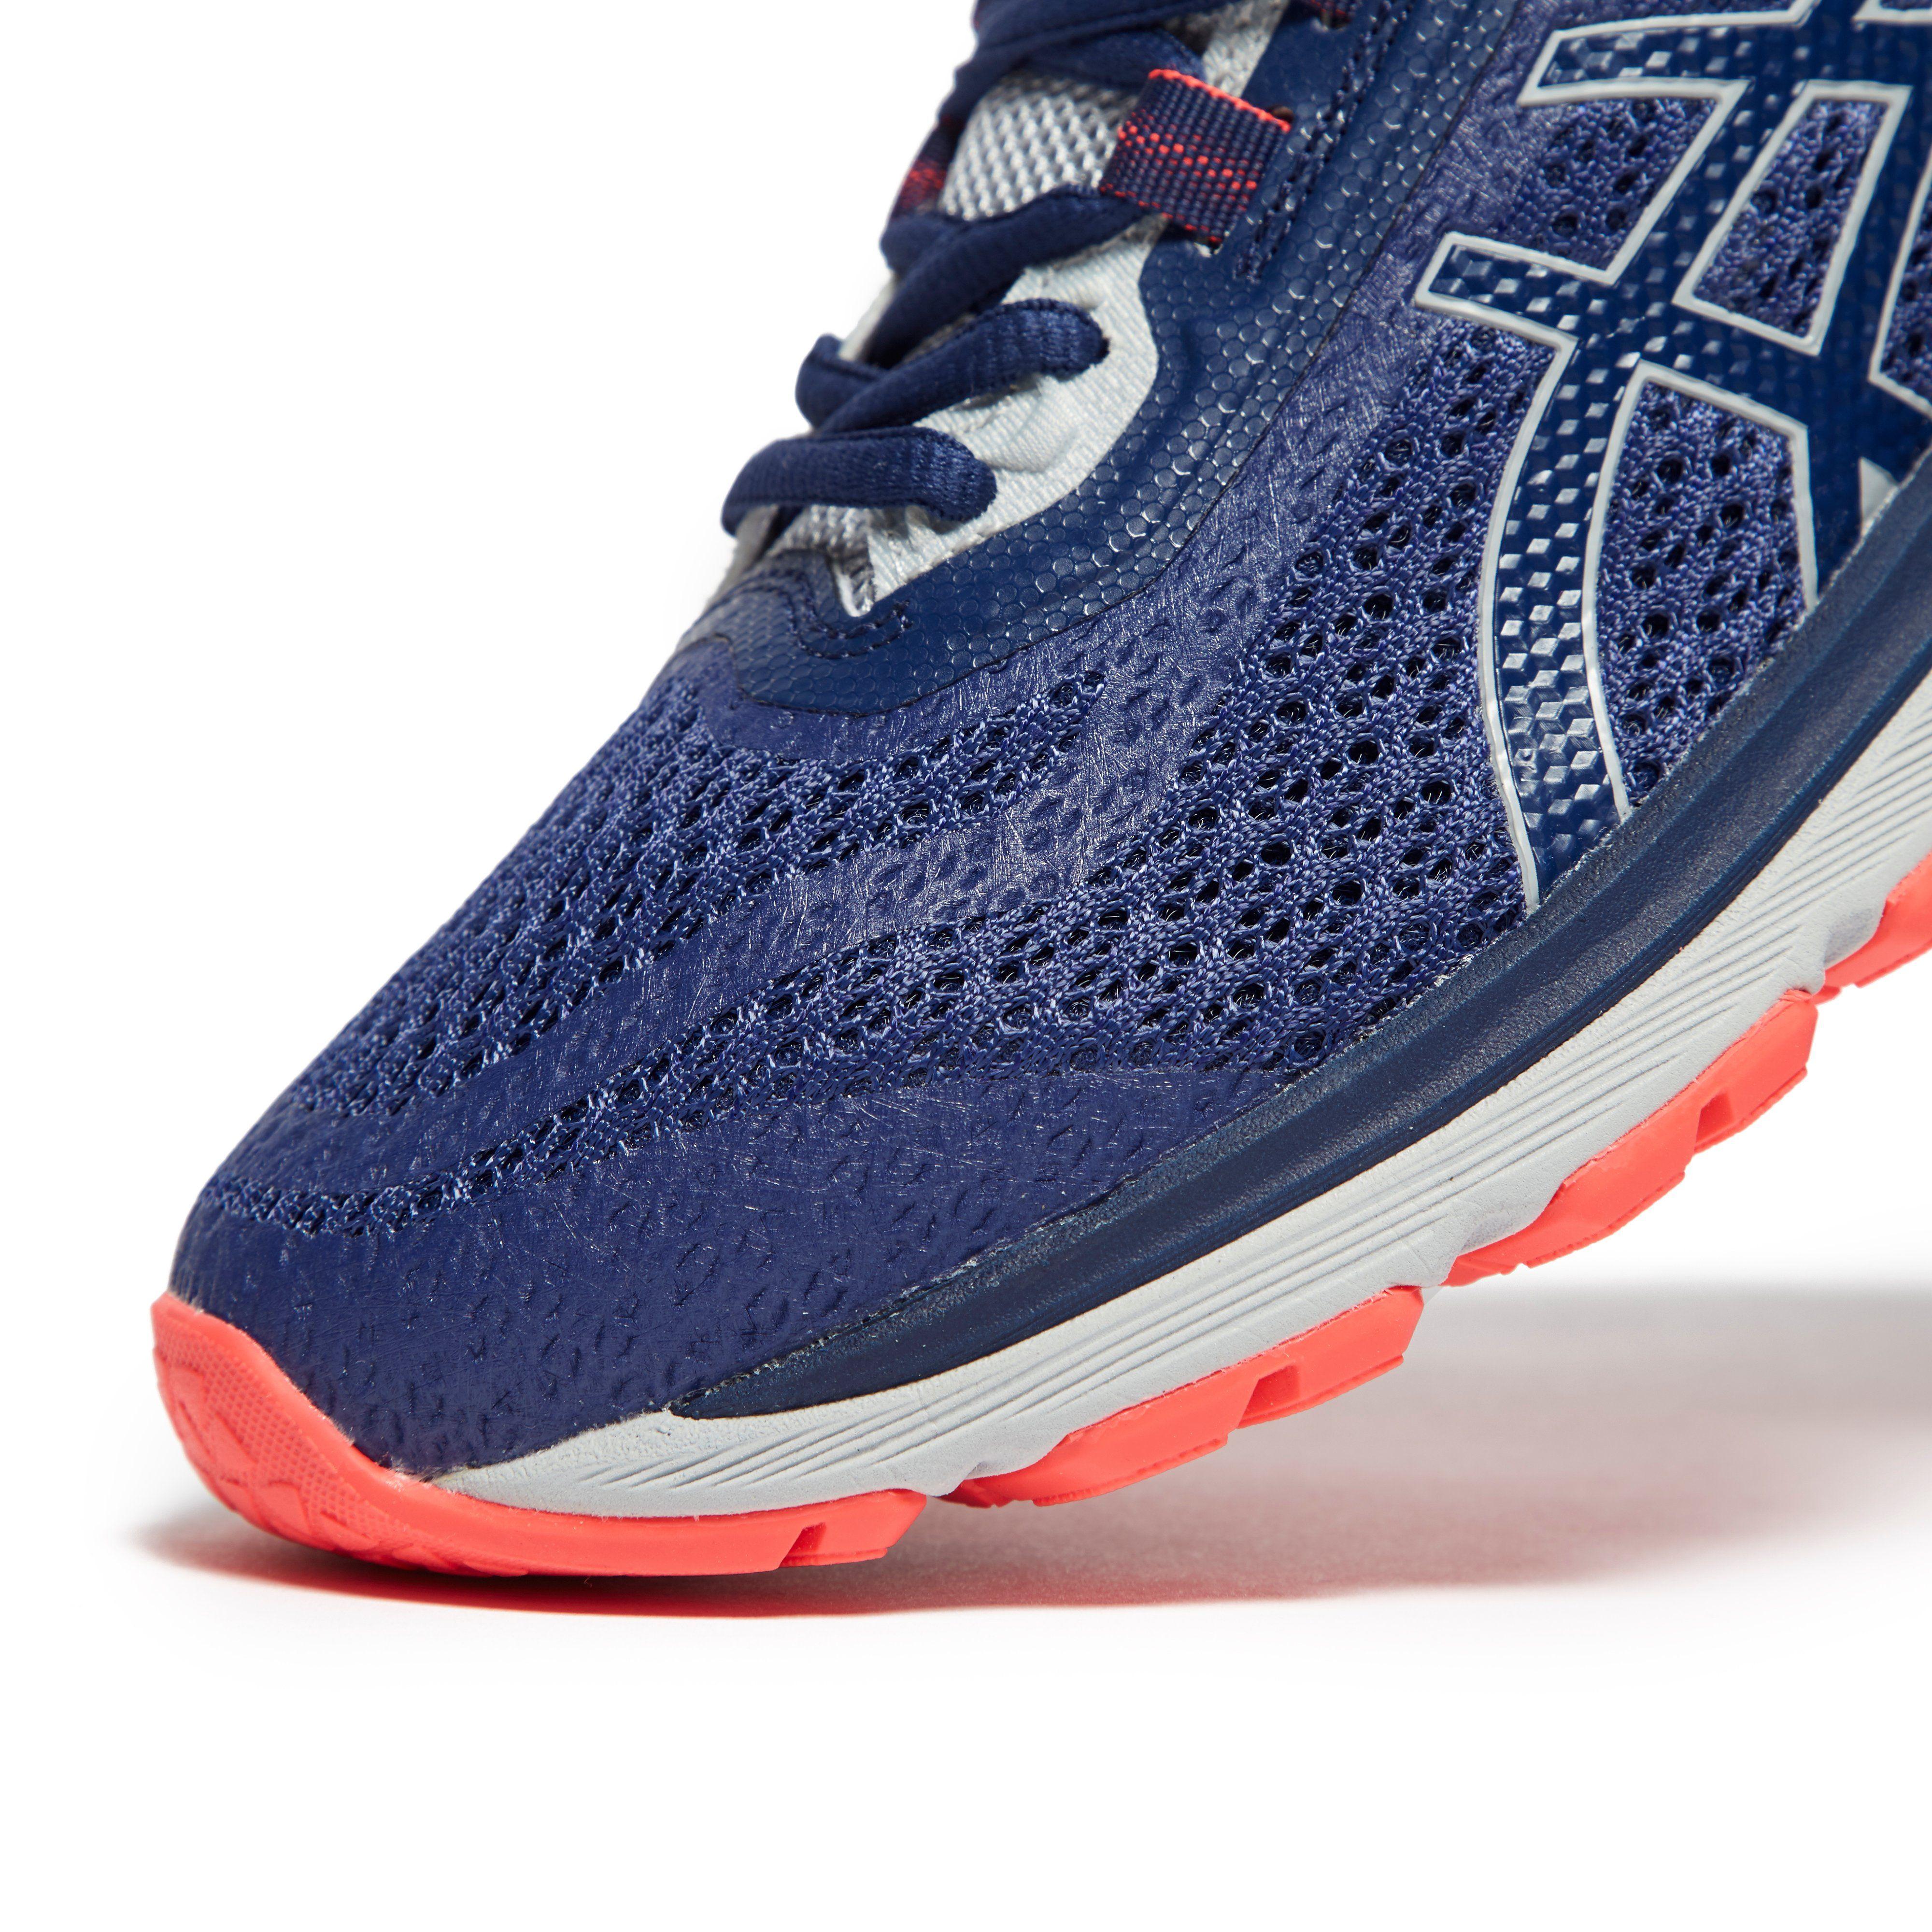 ASICS GT-2000 6 Plasmaguard Women's Trail Running Shoes